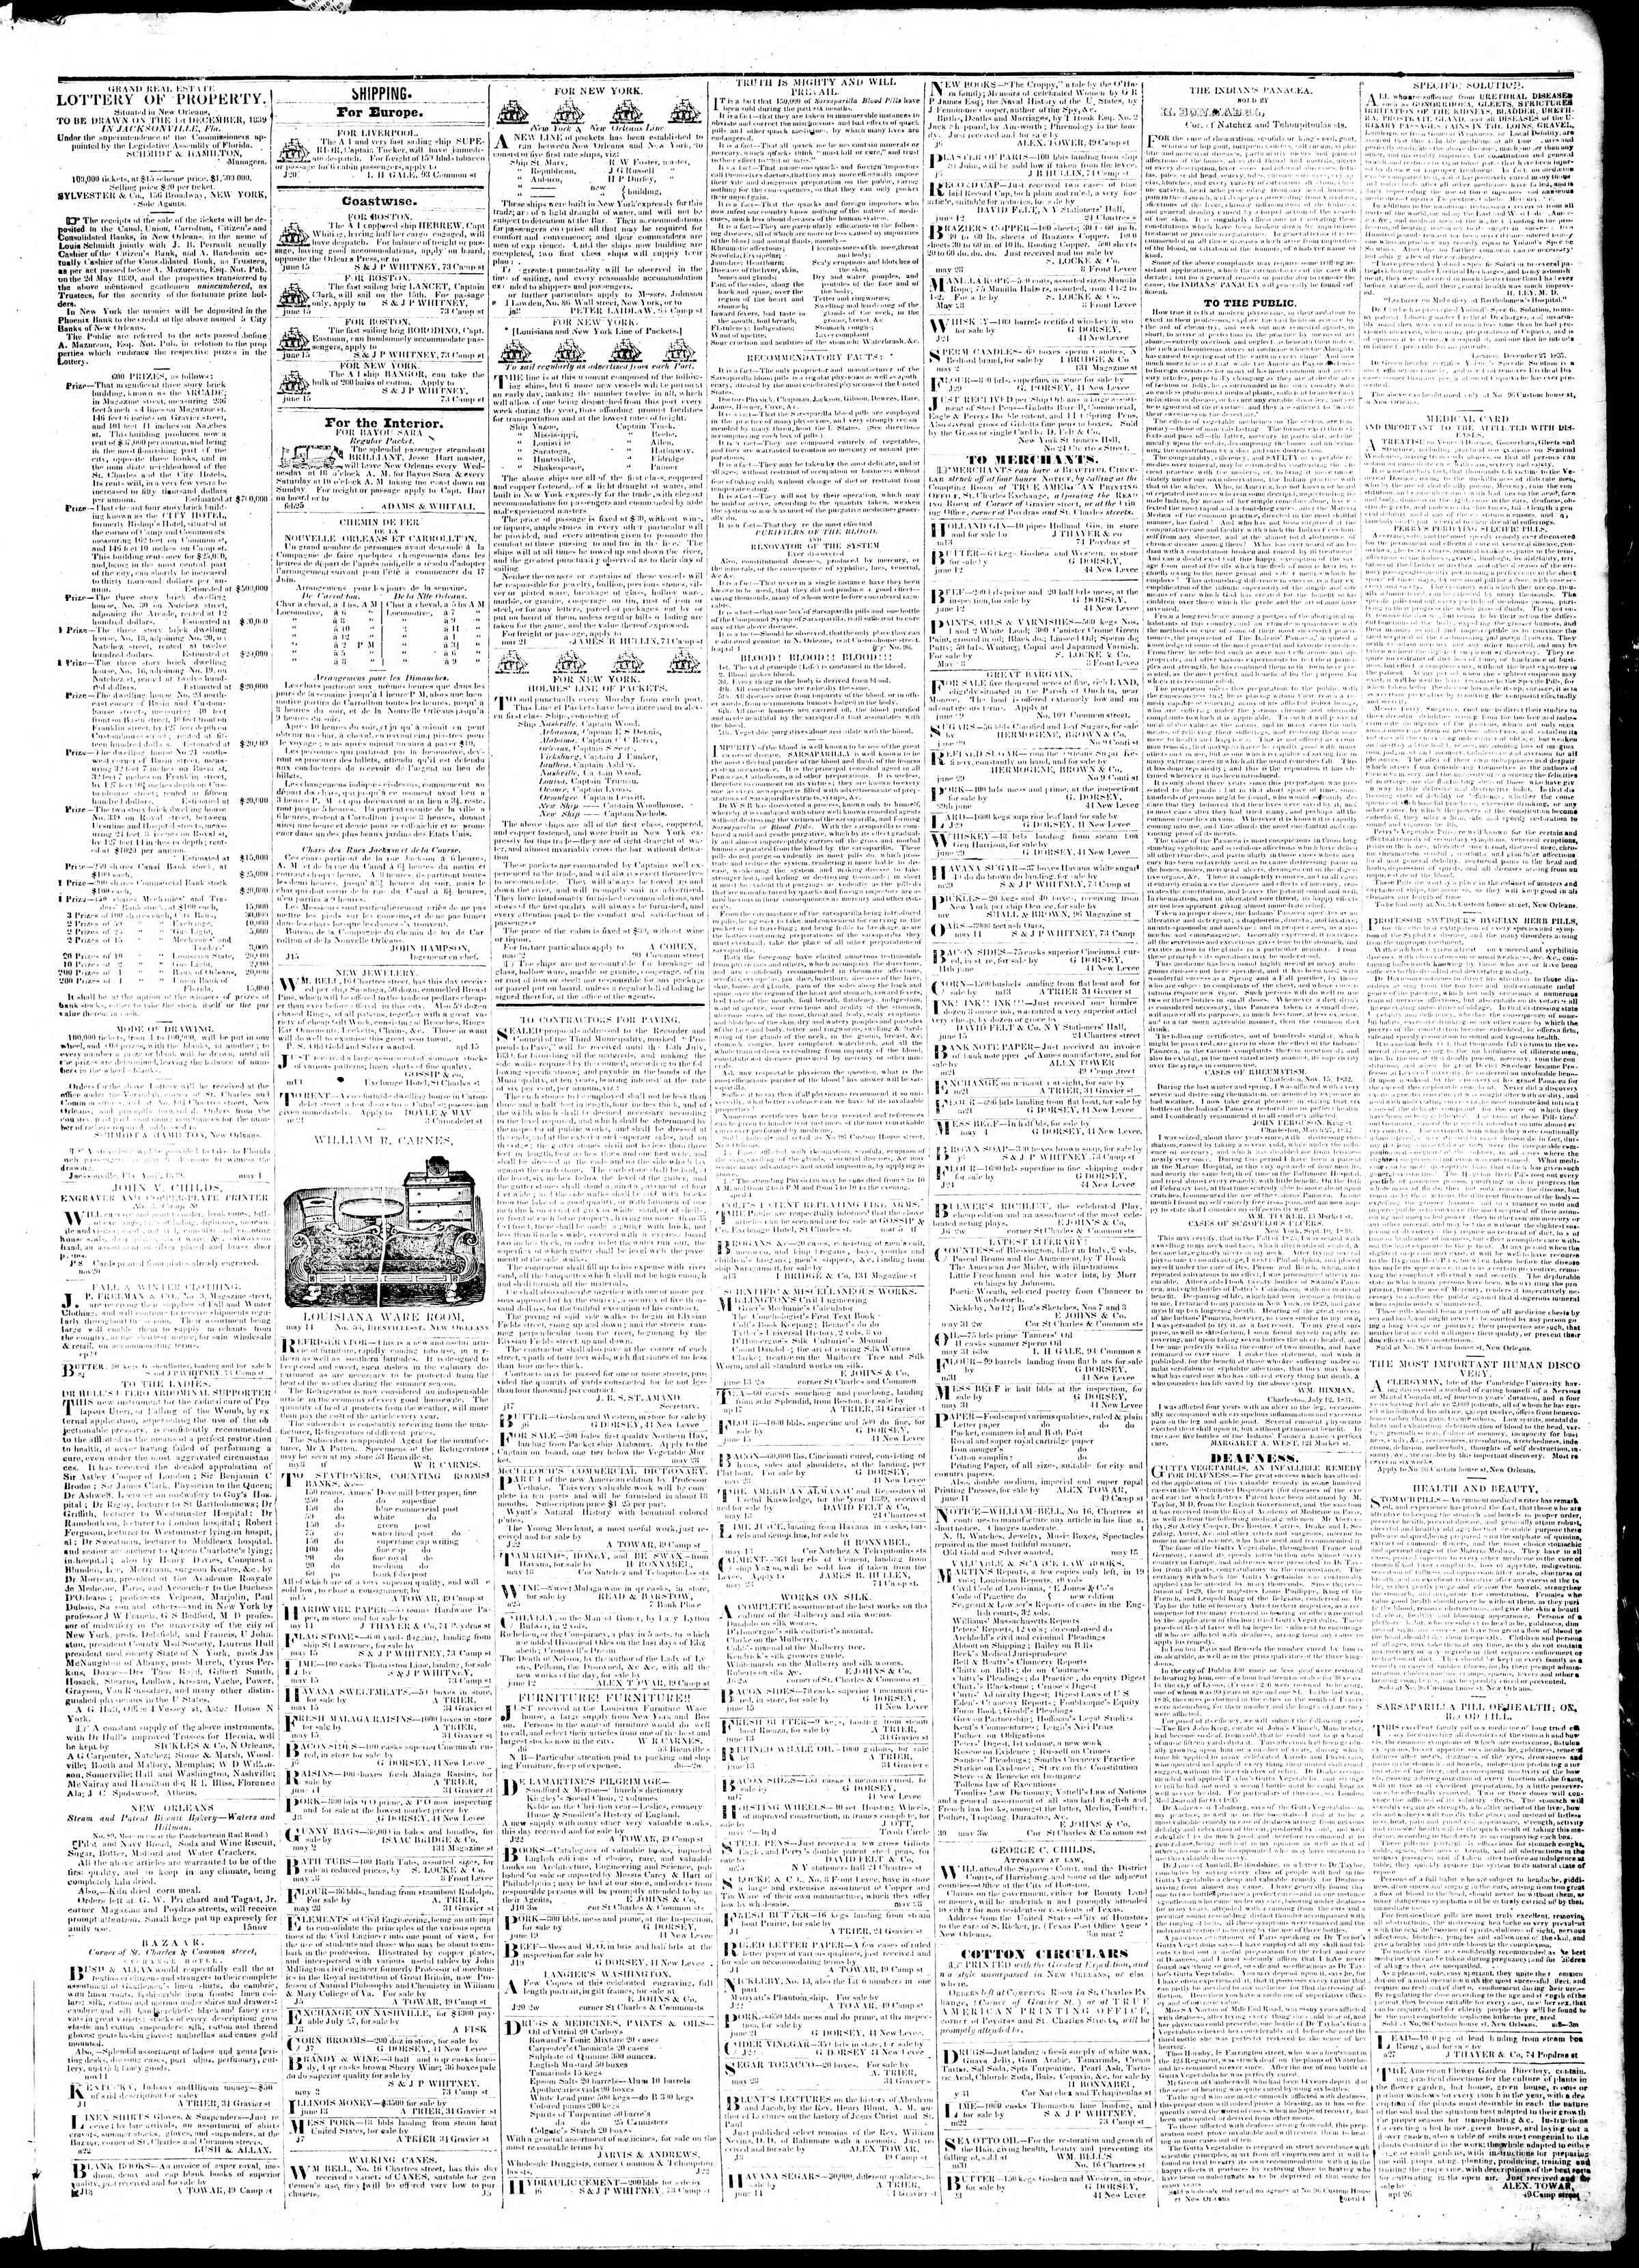 July 9, 1839 Tarihli True American Gazetesi Sayfa 3